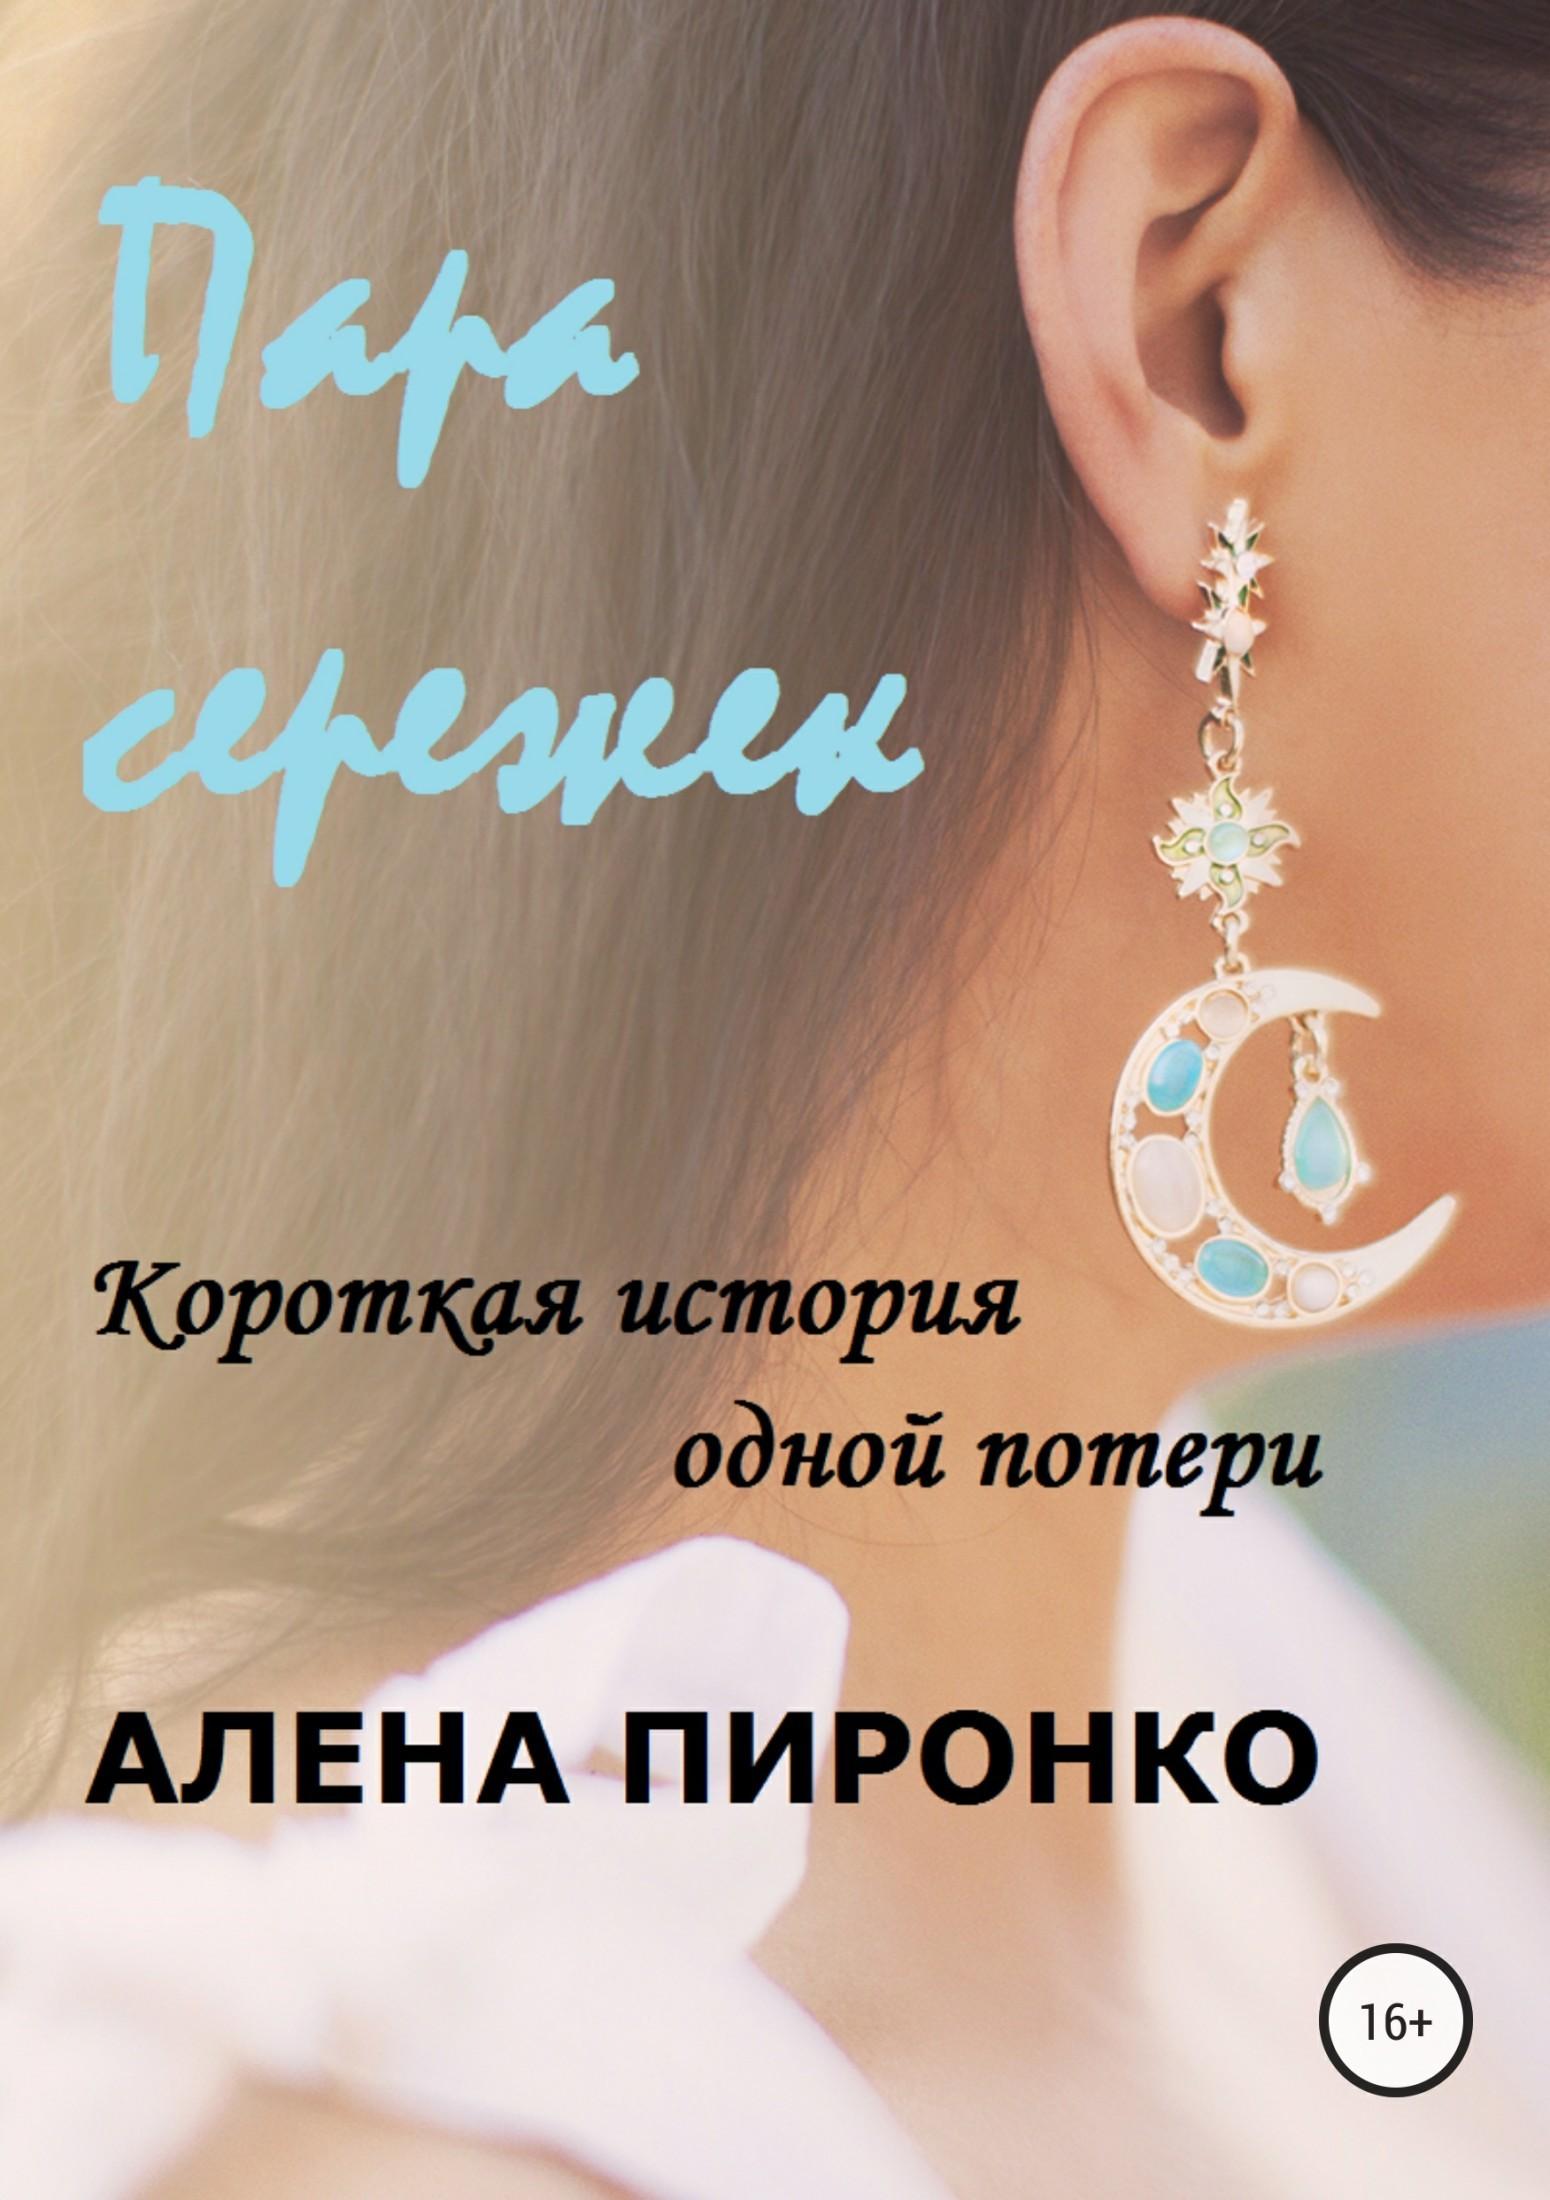 Обложка книги Пара сережек, автор Алена Пиронко